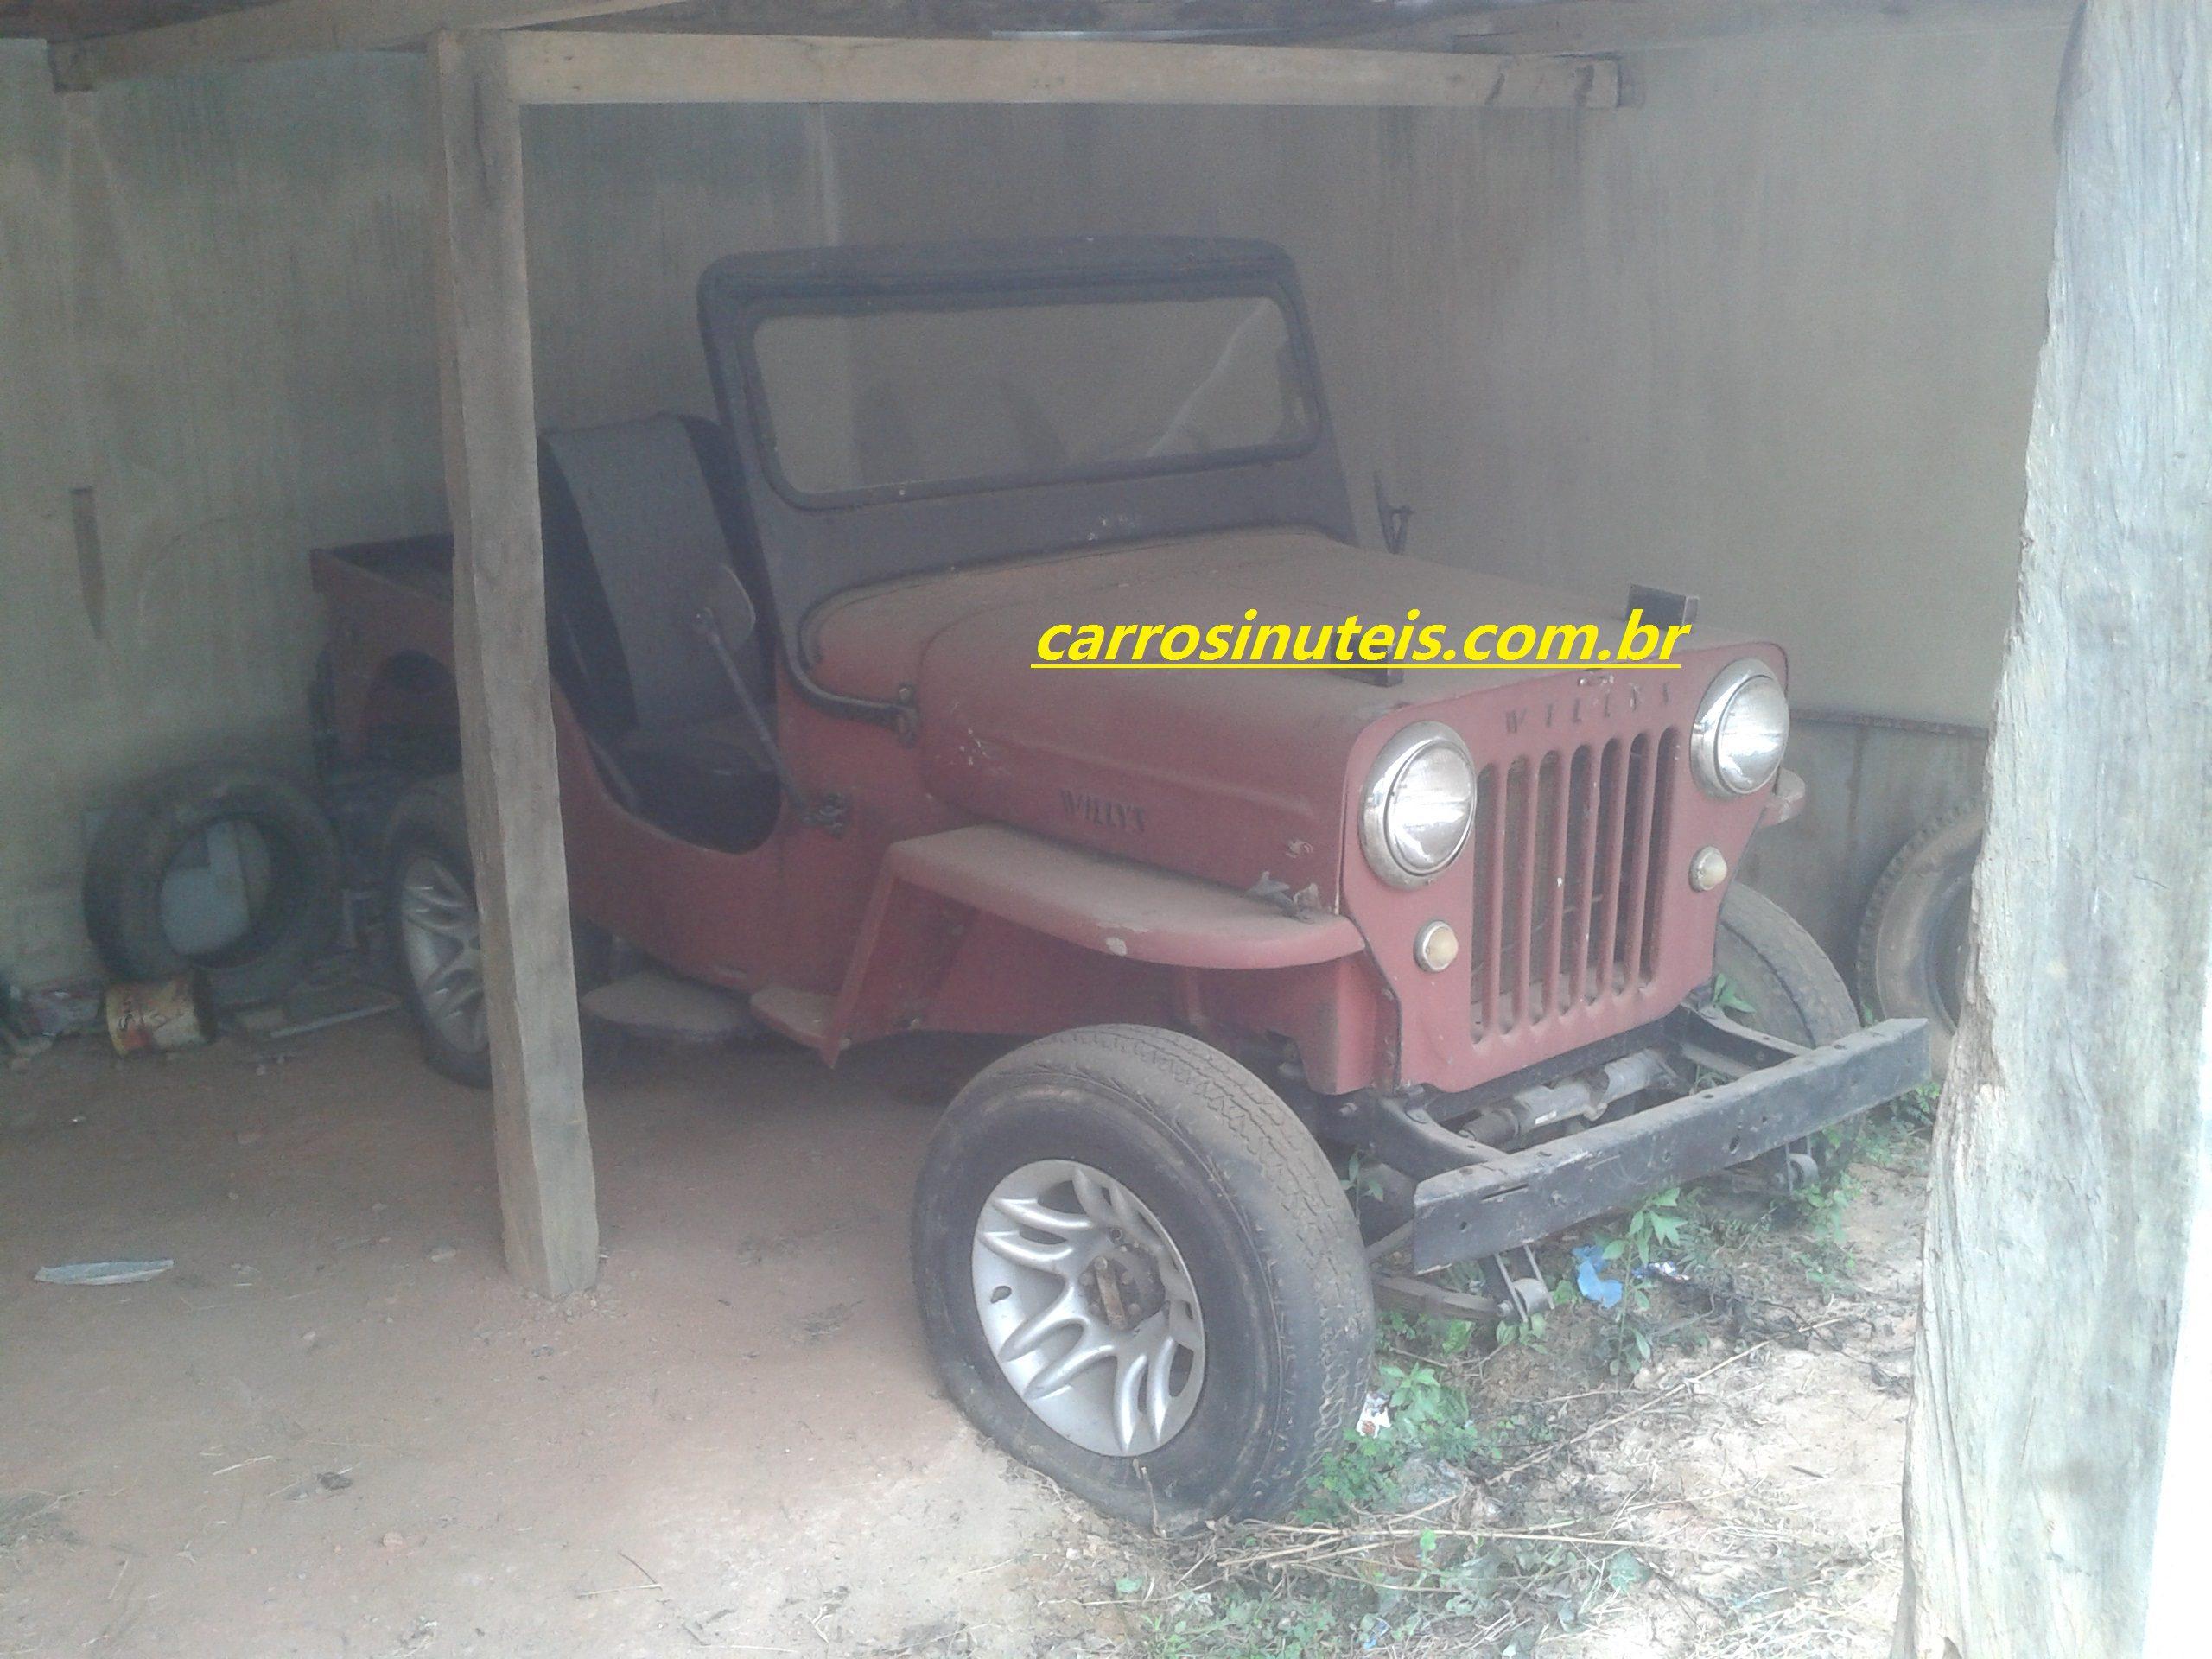 bretz-jeep-iuna-es Jeep, Bretz, Iúna-ES